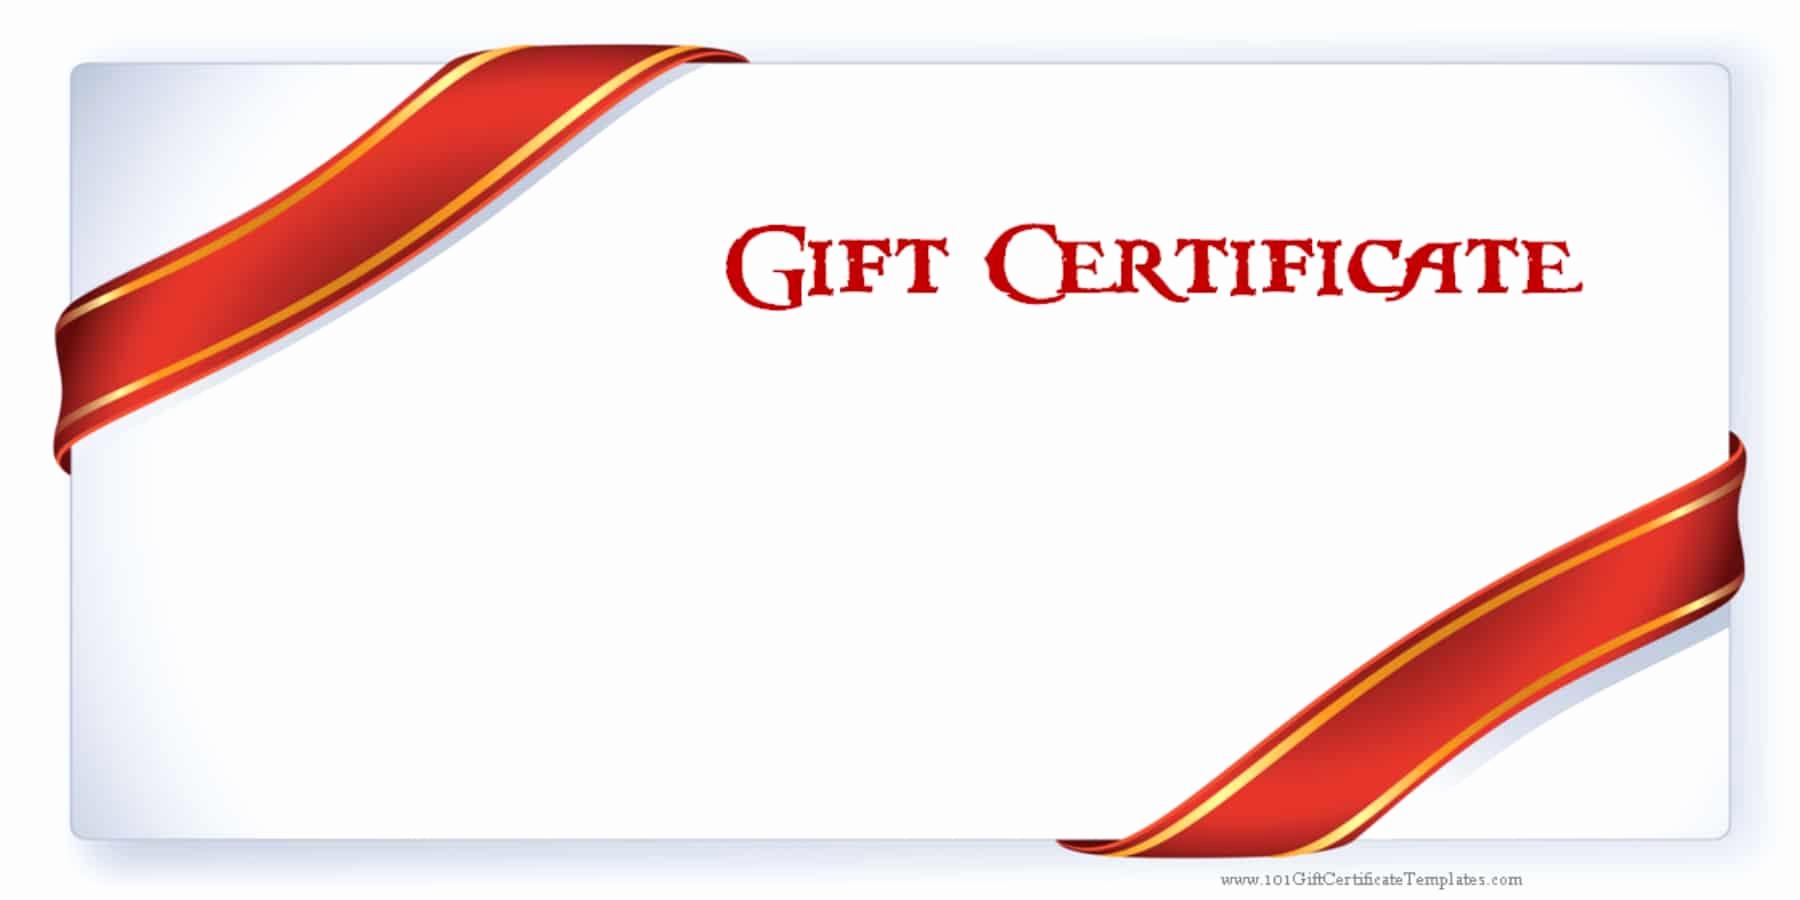 Free Gift Certificate Templates Elegant Printable Gift Certificate Templates